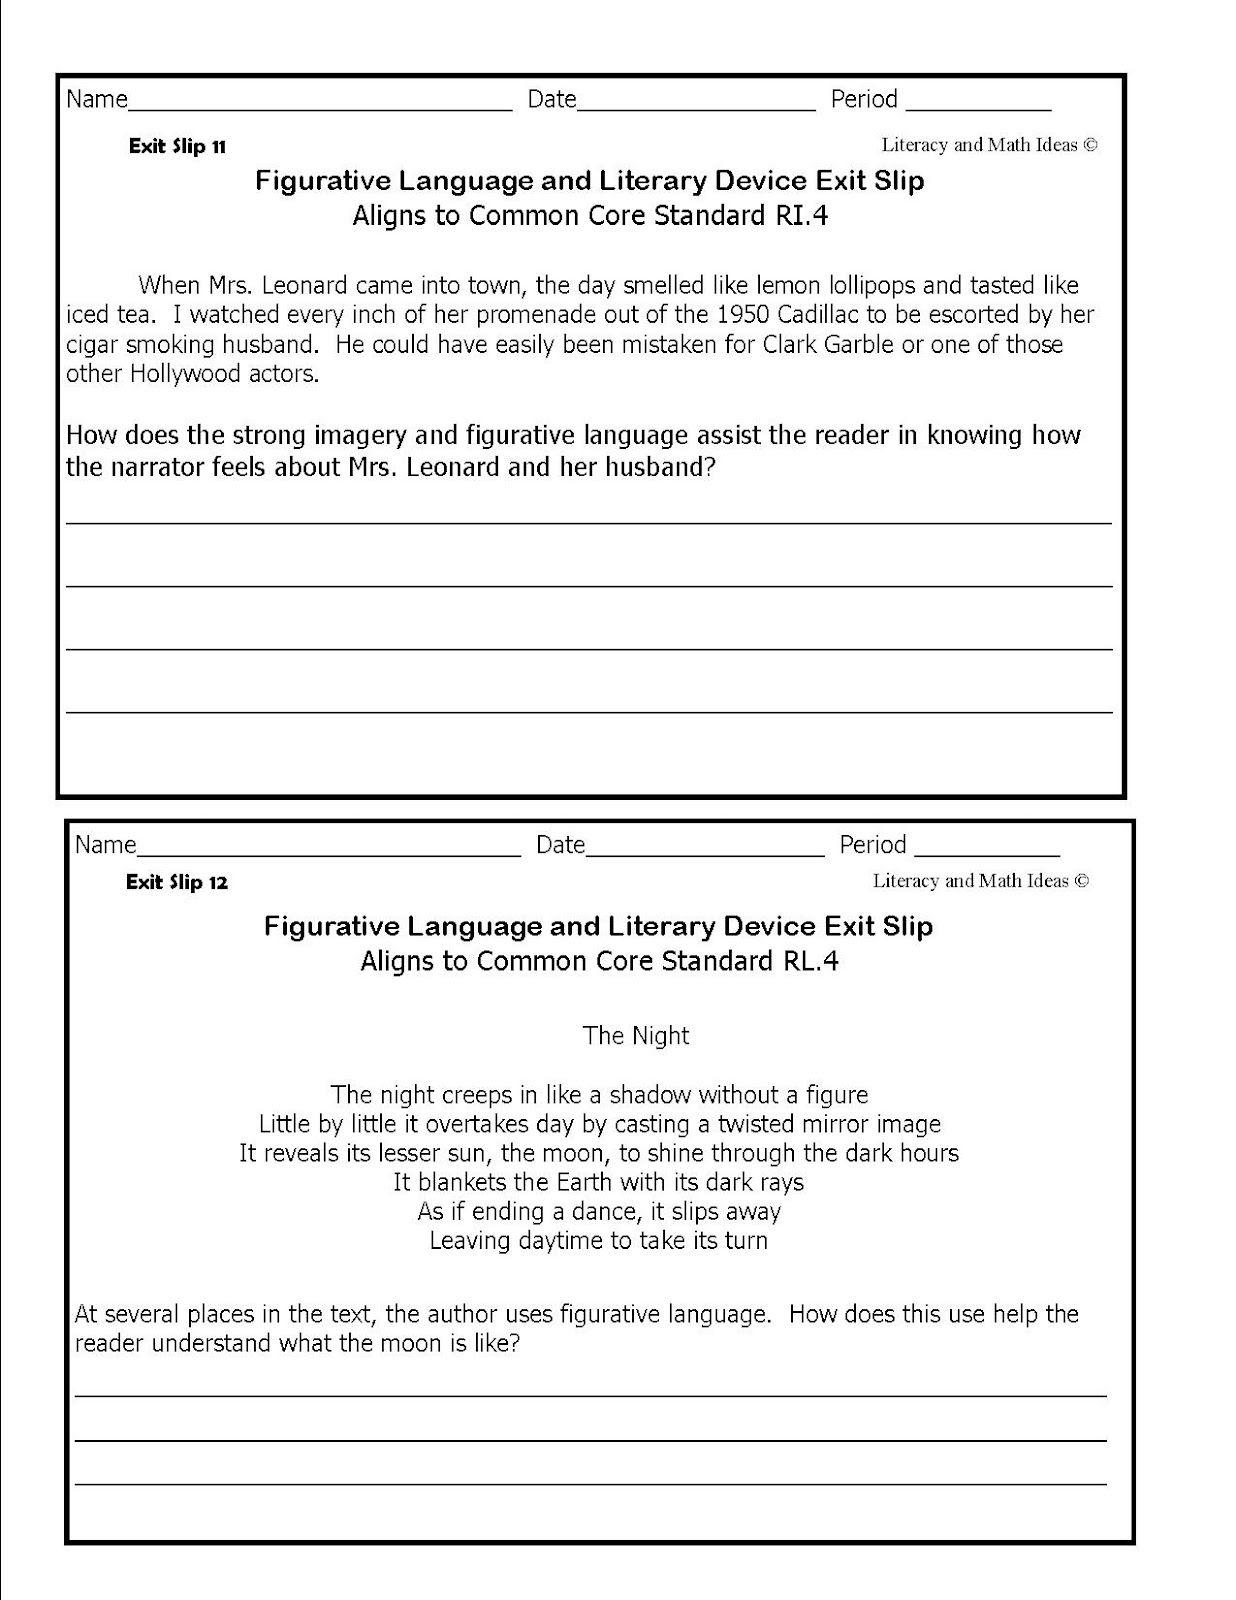 Literacy Amp Math Ideas Common Core For 7th Grade